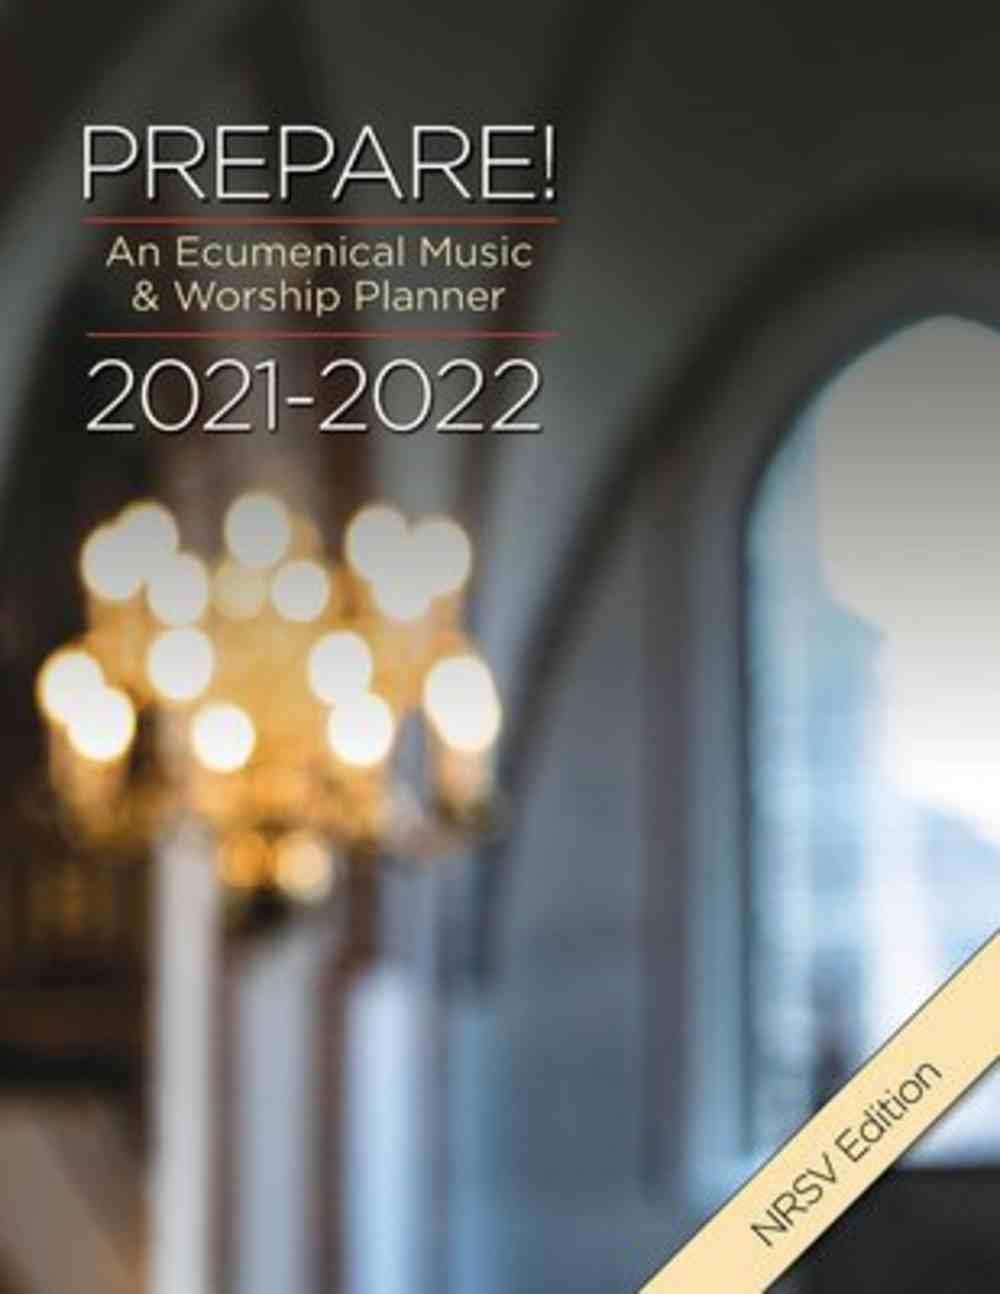 Prepare! 2021-2022 NRSV Edition: An Ecumenical Music & Worship Planner Spiral